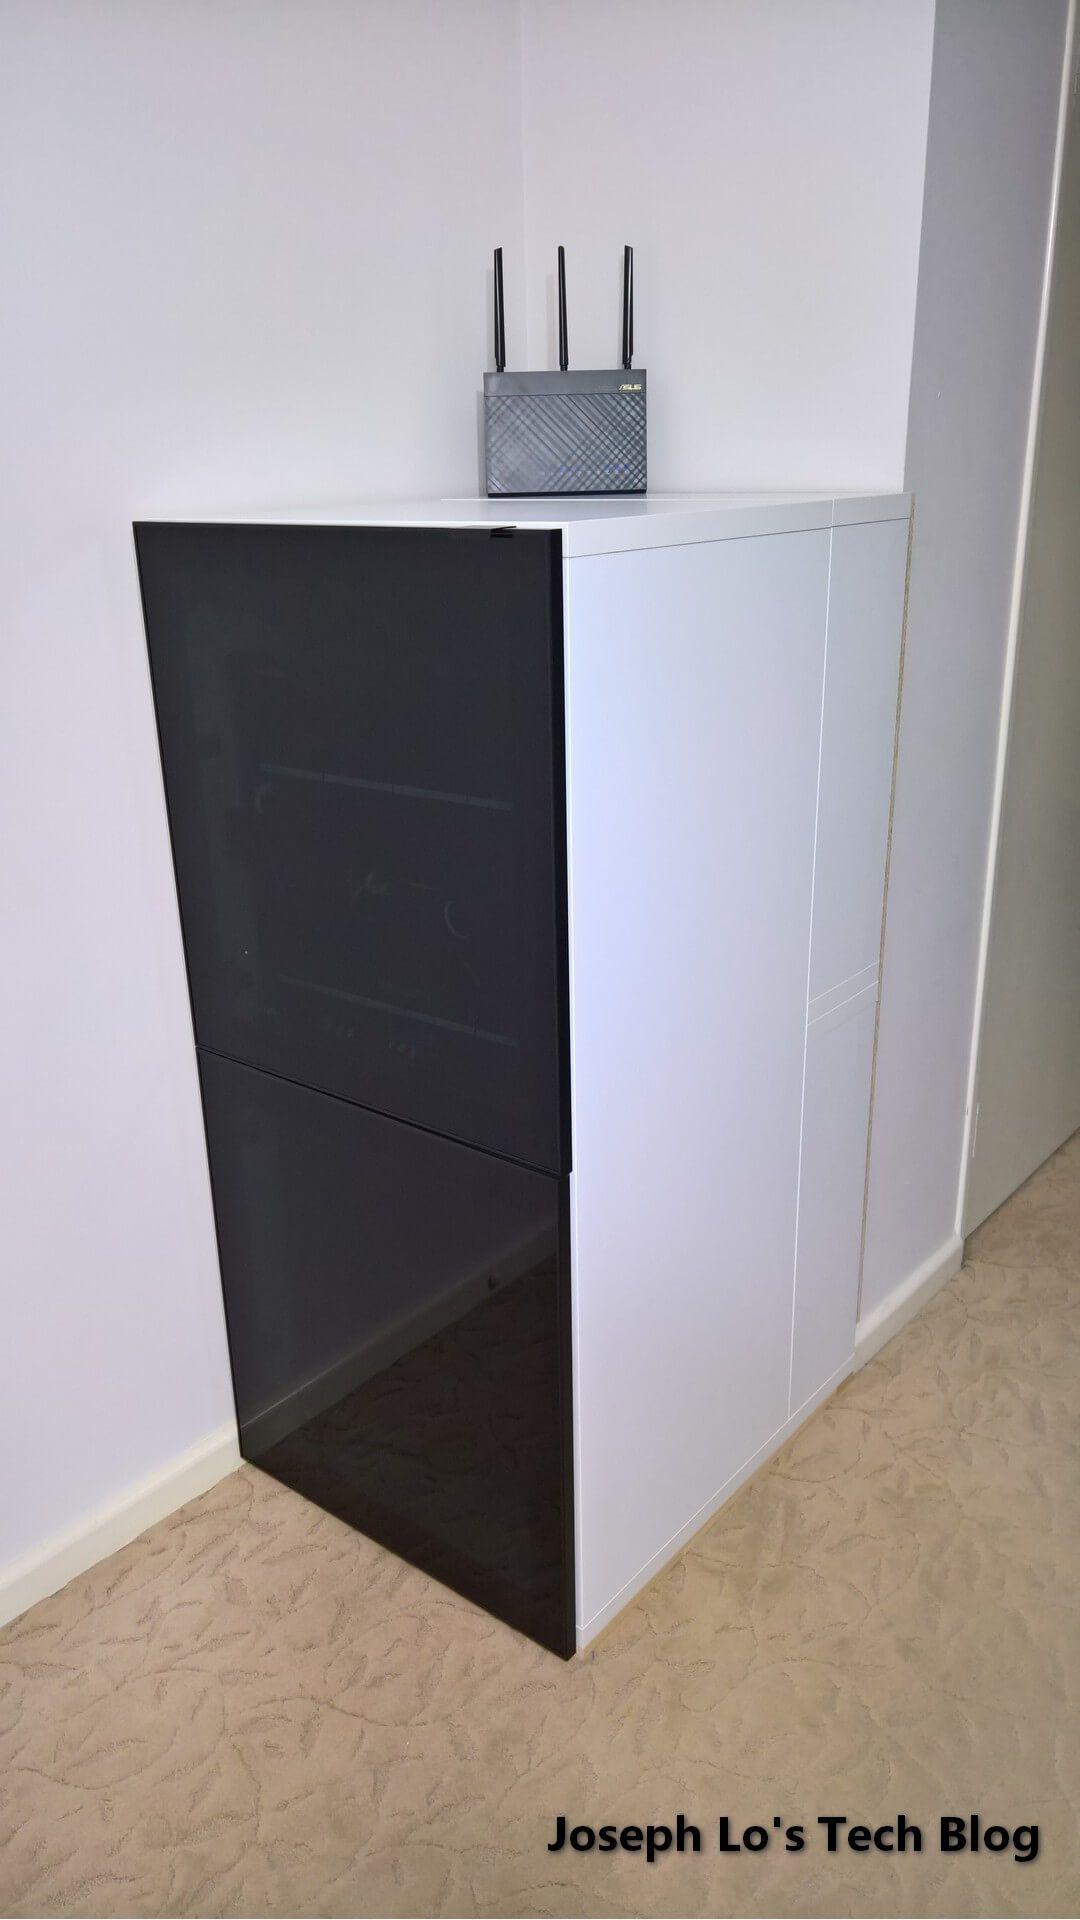 Diy Server Cabinet Using Ikea Parts Server Cabinet Ikea Diy